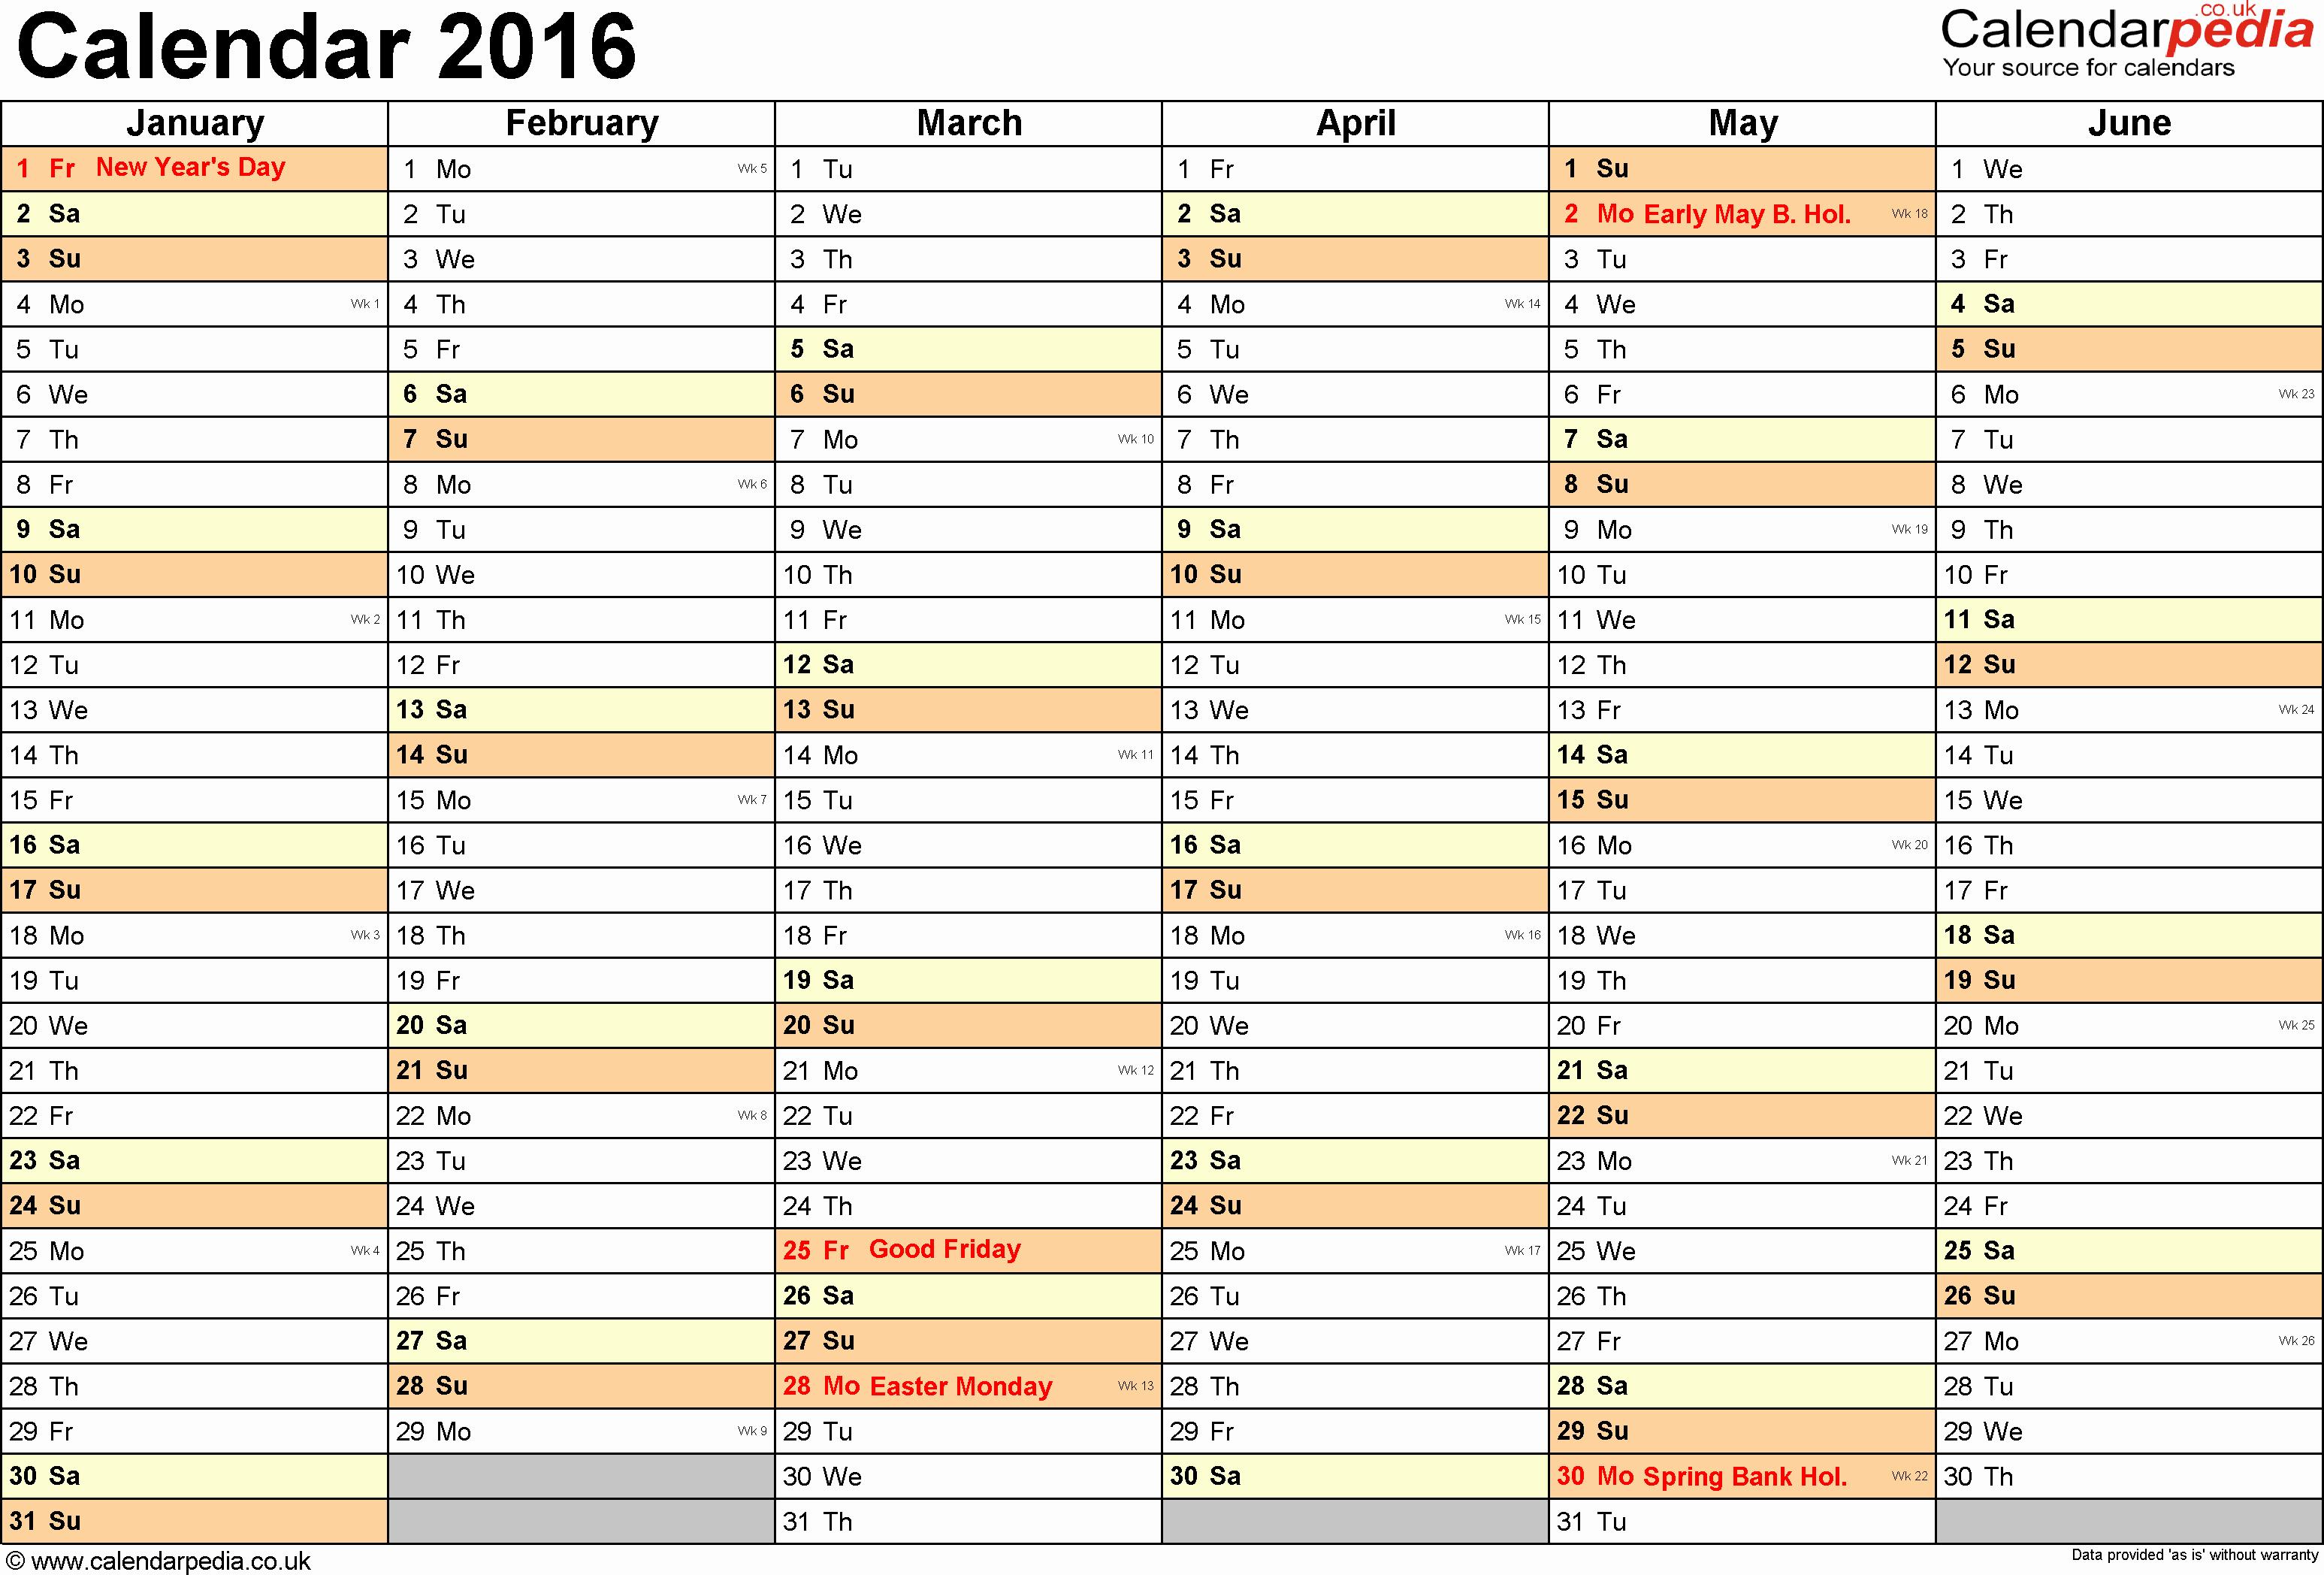 3 Month Calendar Printable 2016 New Excel Calendar 2016 Uk 16 Printable Templates Xlsx Free